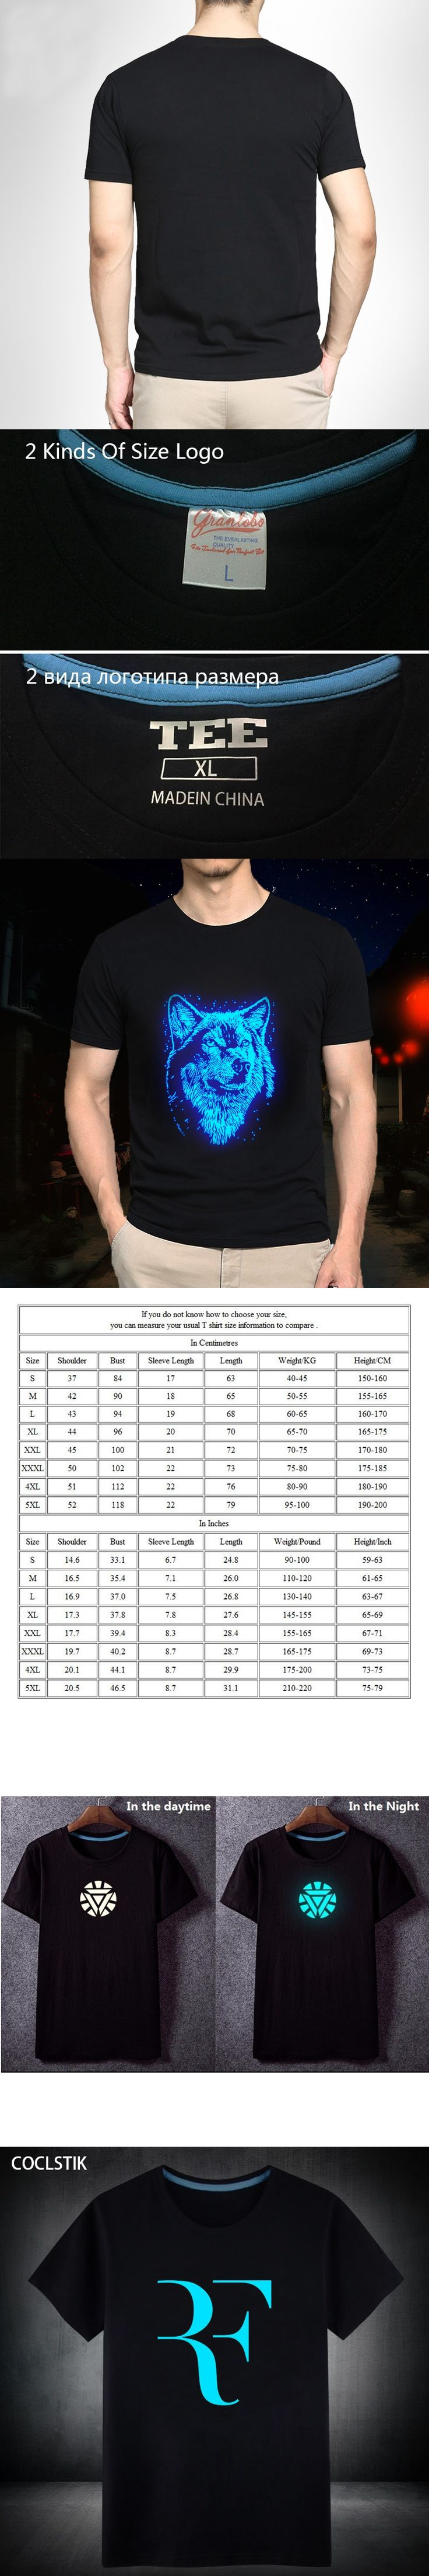 100% Cotton Summer Fluorescent Letter Printed T Shirt Mens Roger Federer Fitness T-shirt Homme Streetwear Hip Hop Tops Tee S-5XL